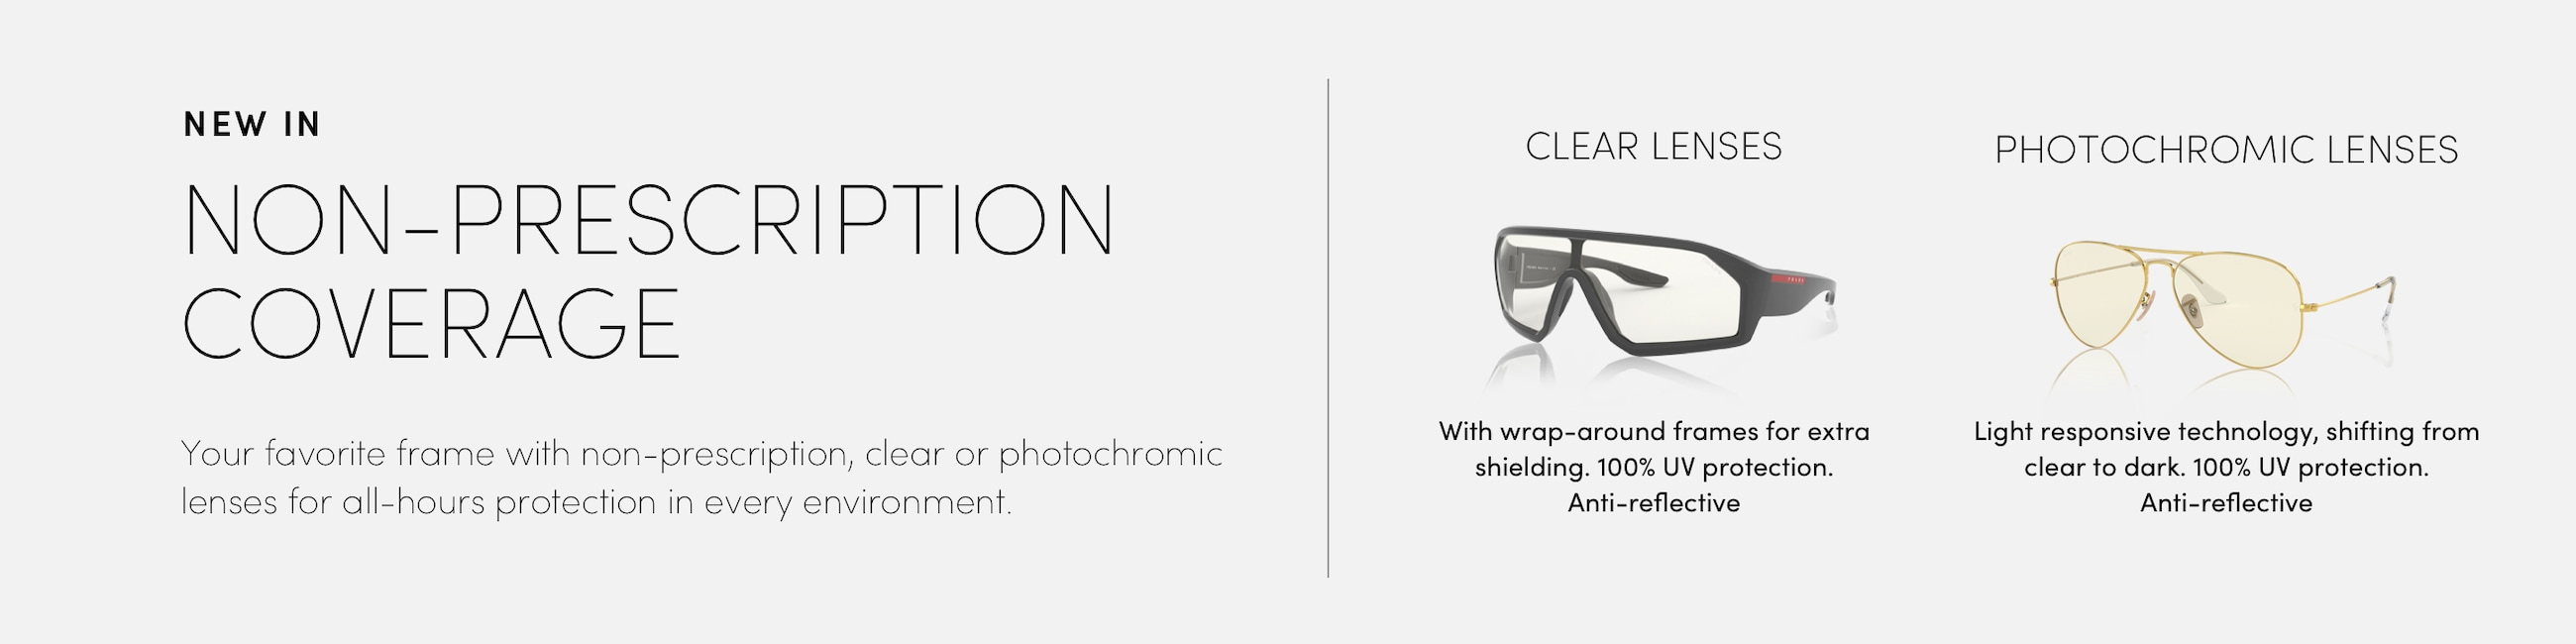 Non prescription coverage. Clear and Photochromic lenses.